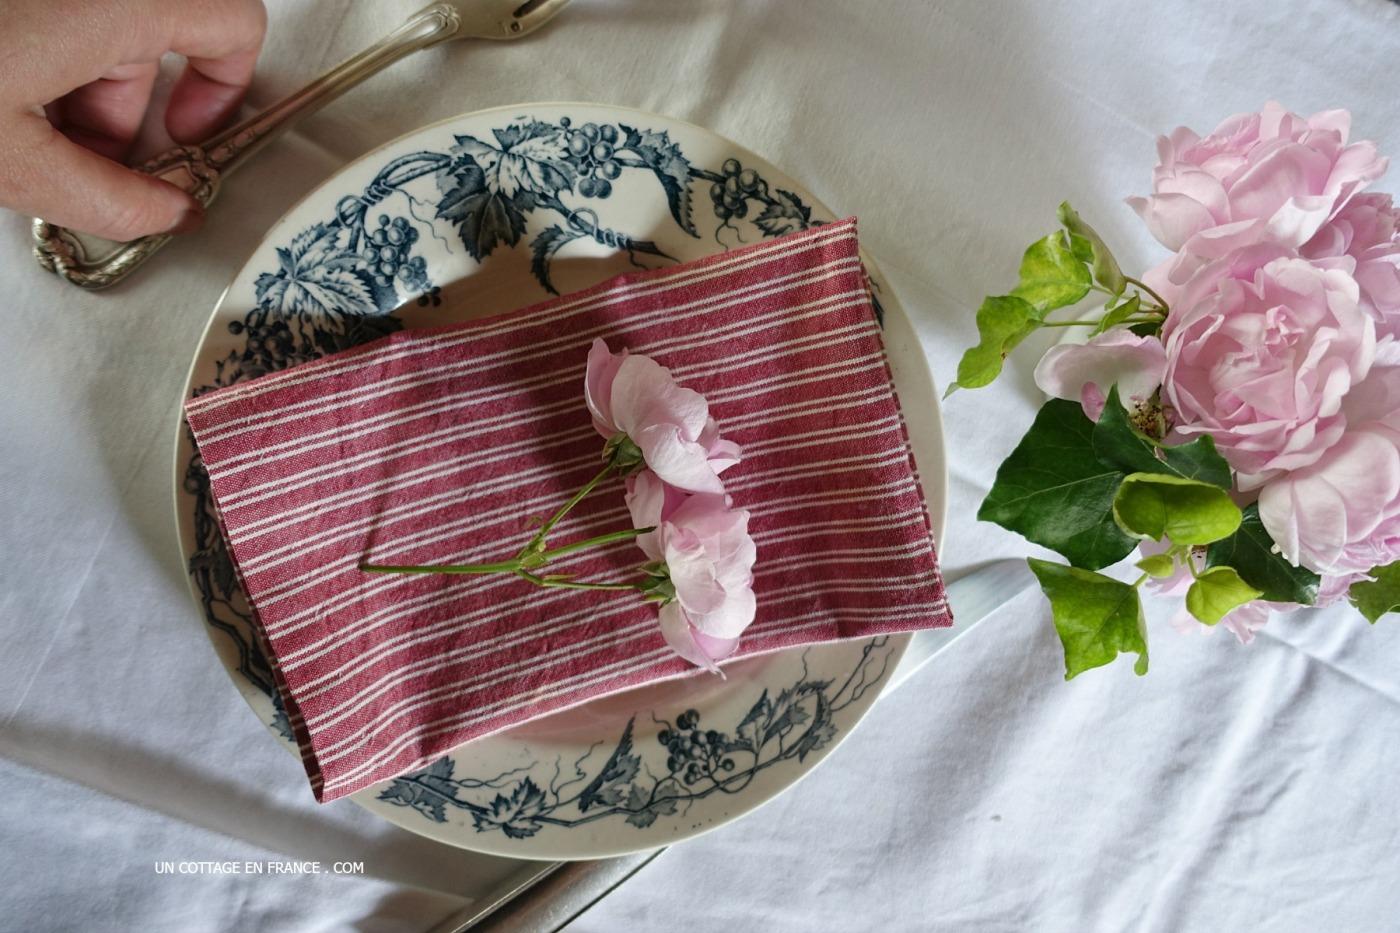 petit bouquet de table de la giralda la giralda s little cabbage roses table arrangement un. Black Bedroom Furniture Sets. Home Design Ideas